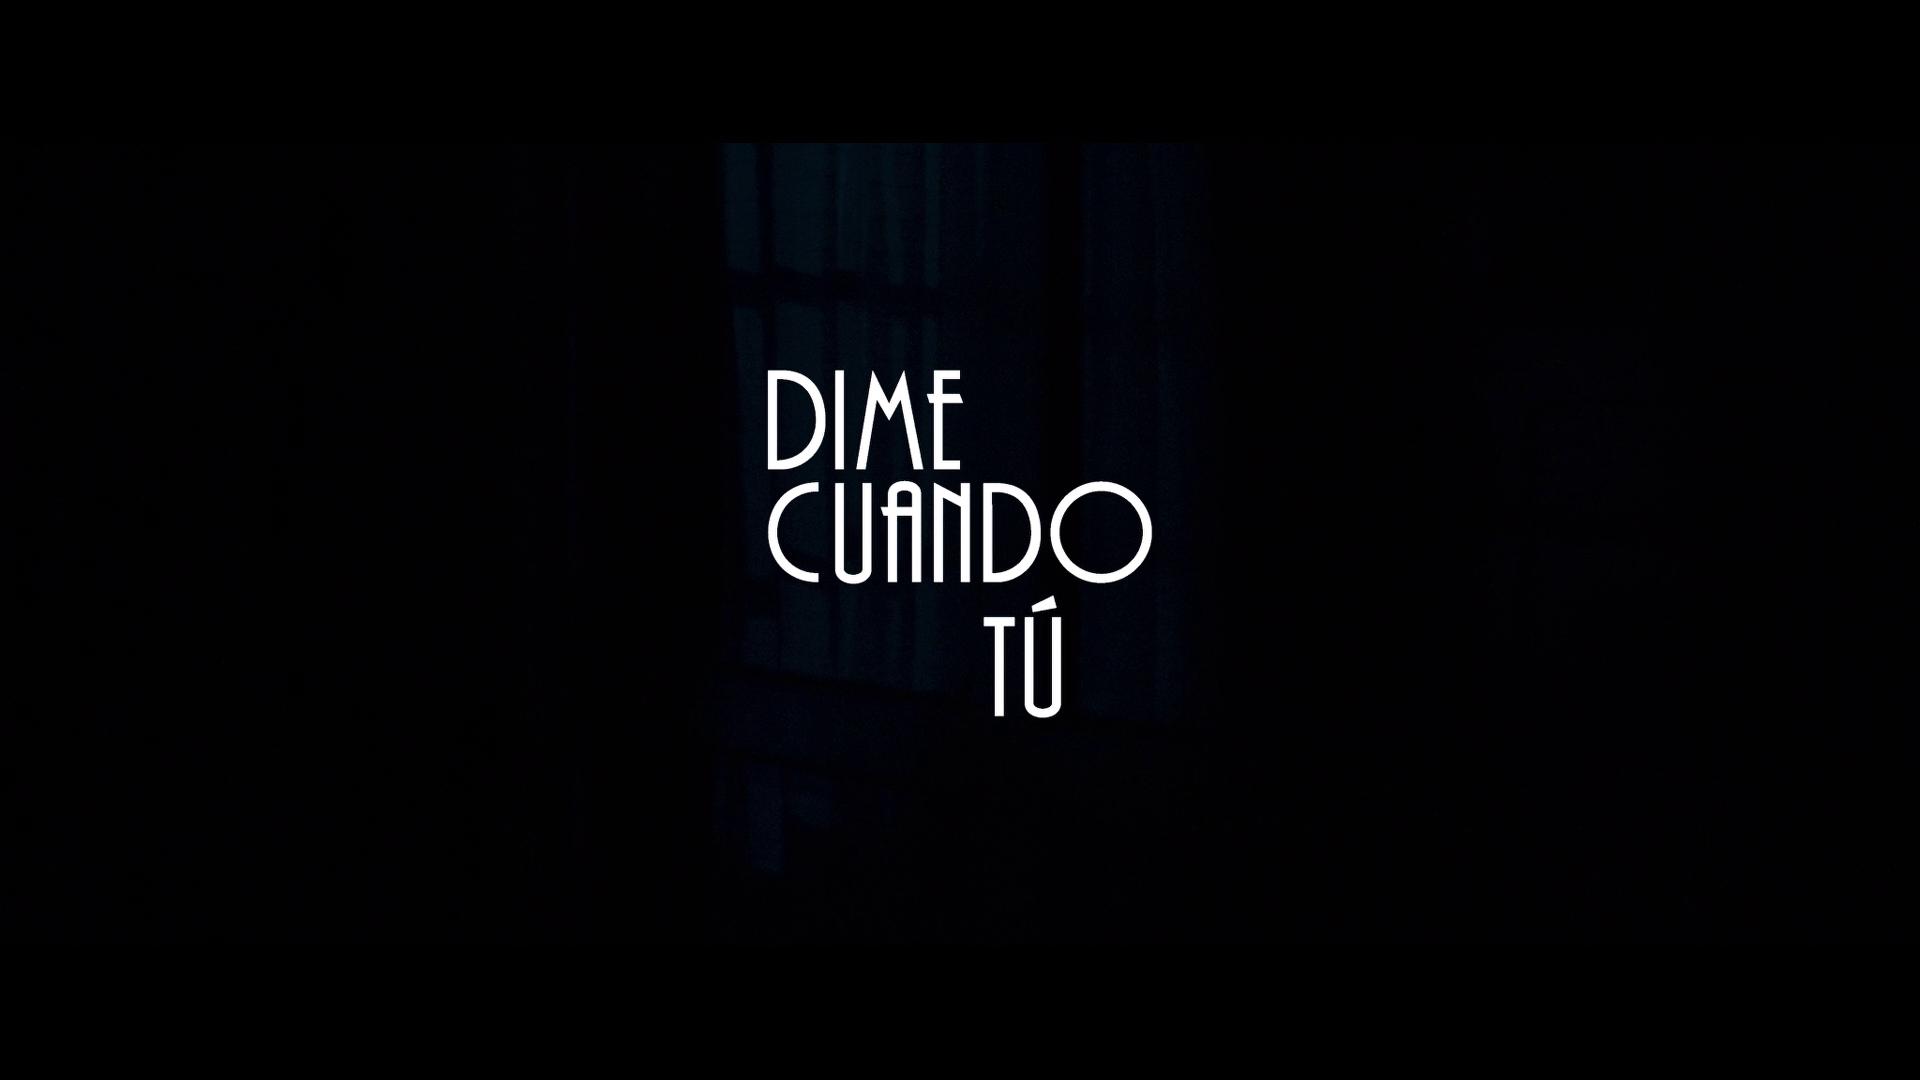 Dime cuando tú (2020) 1080p WEB-DL Latino